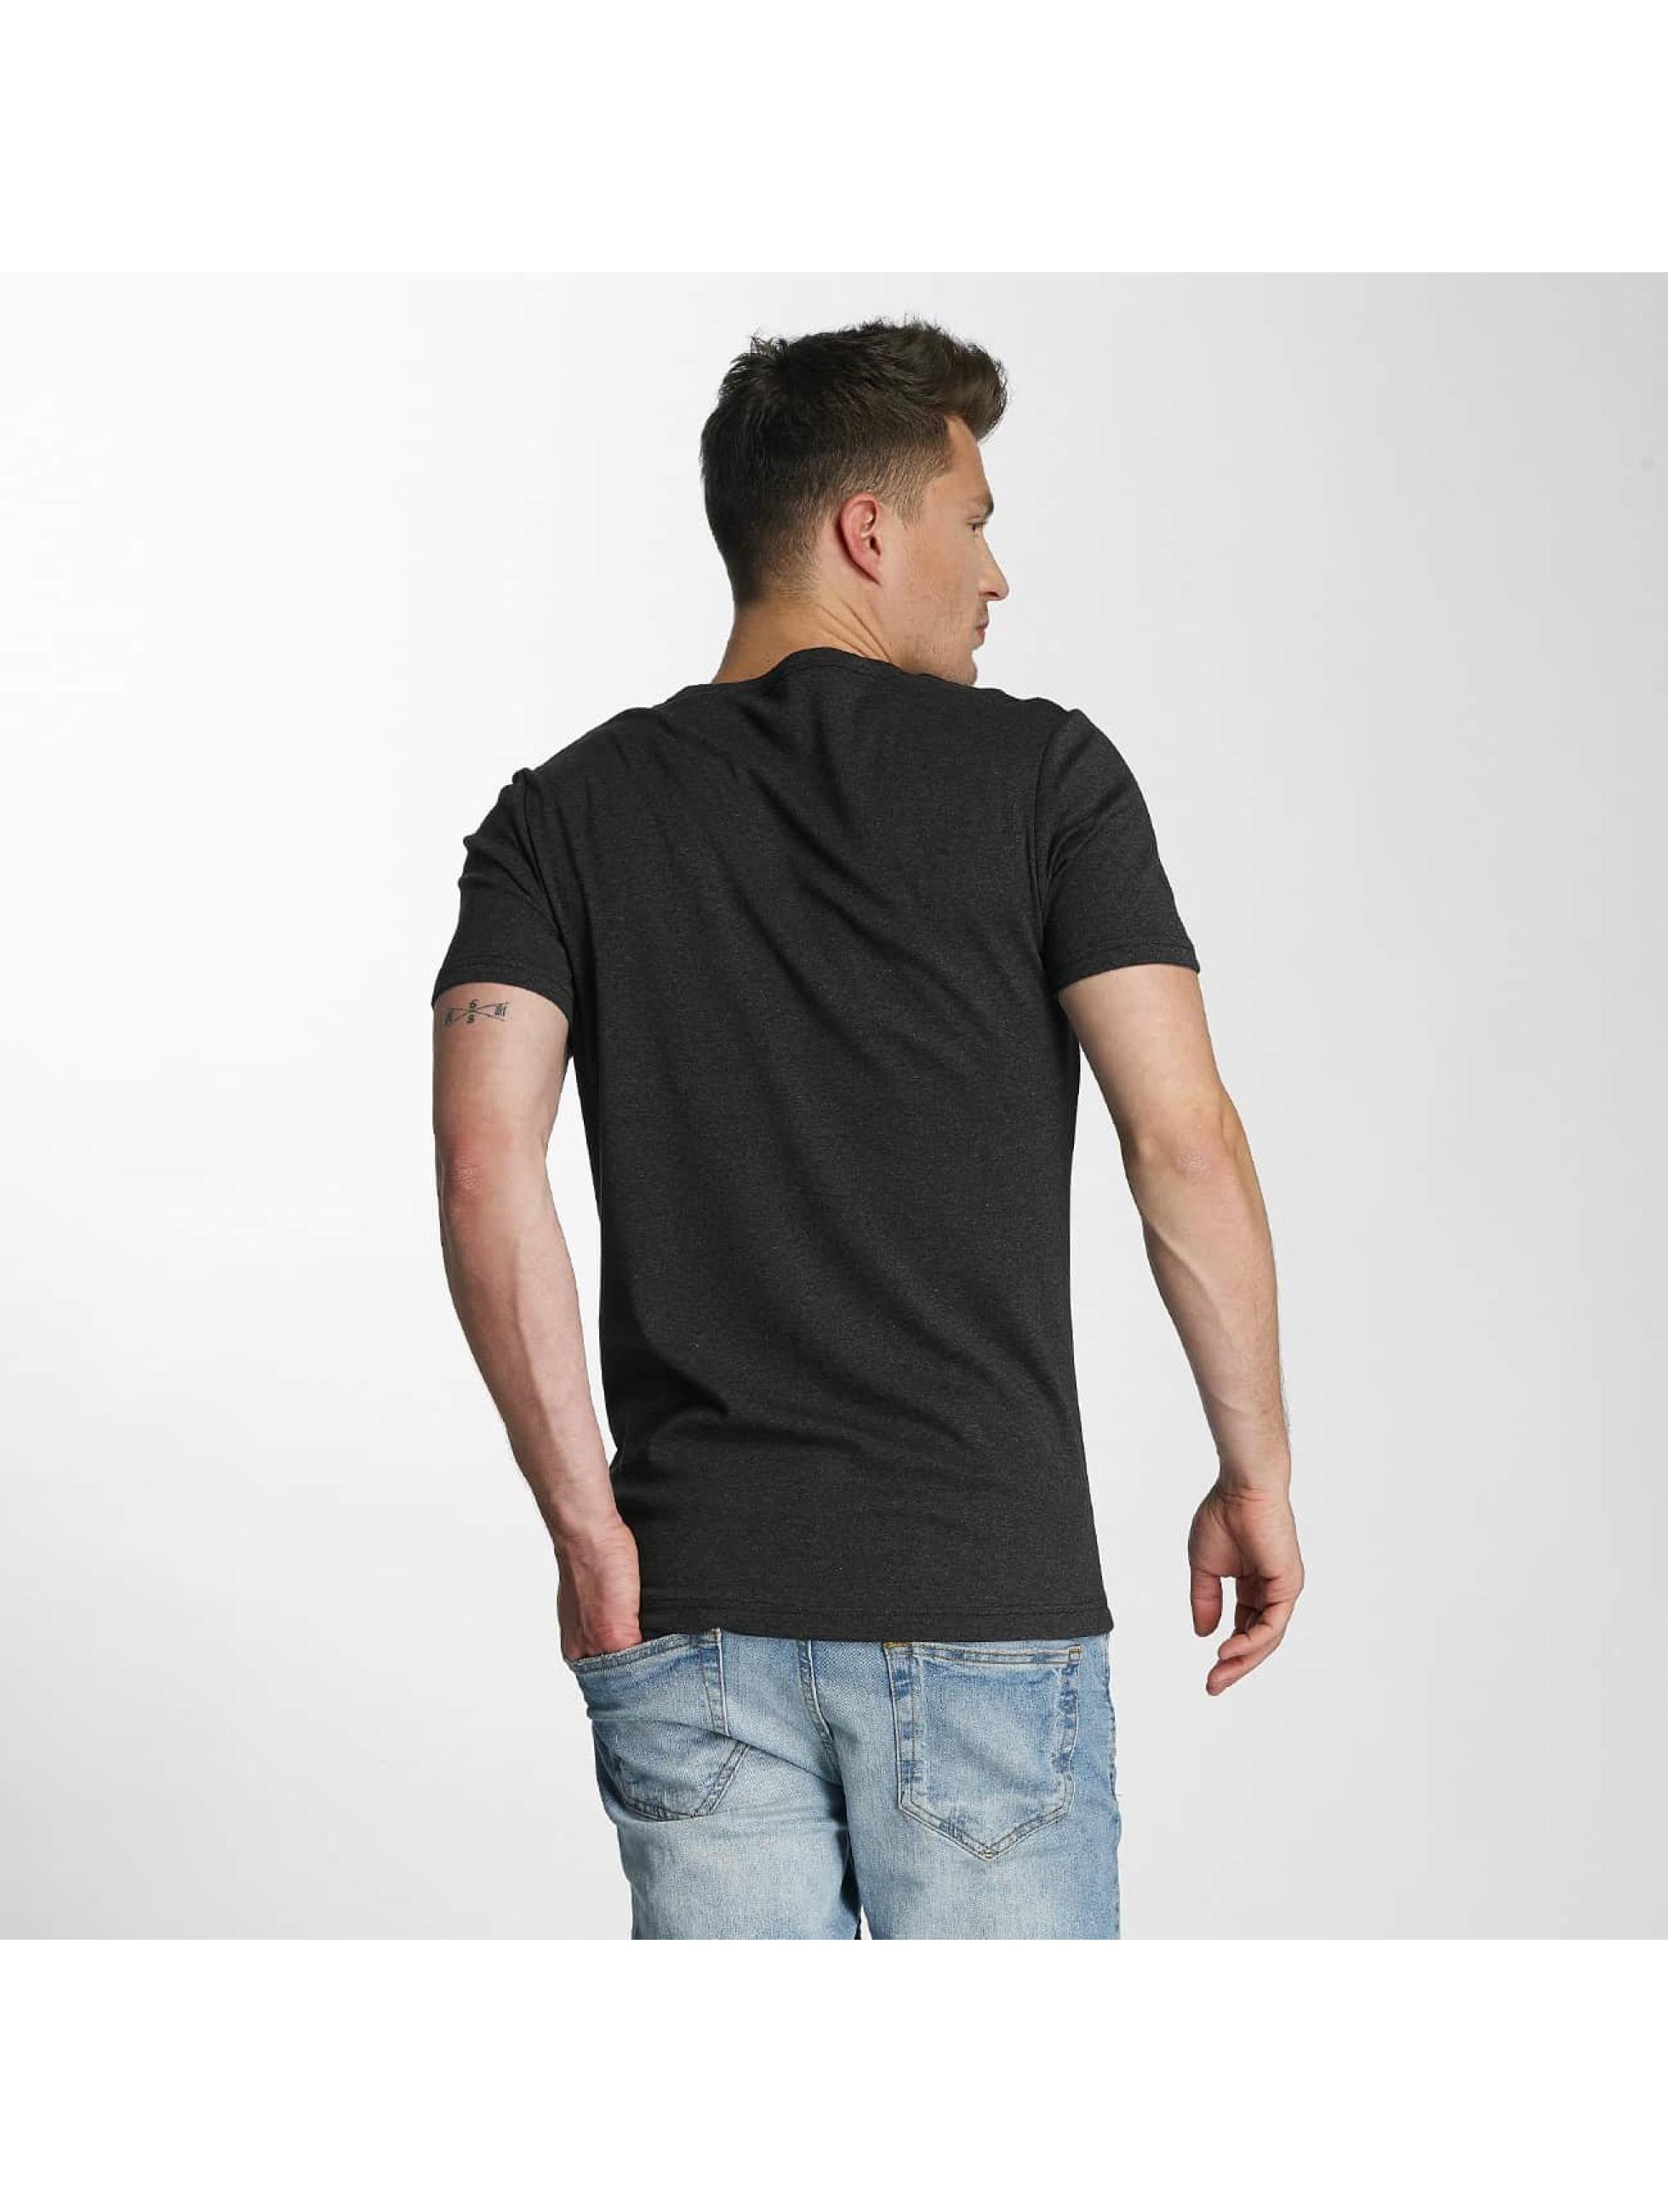 G-Star-Uomini-Maglieria-T-shirt-Drillon-Cool-Rib